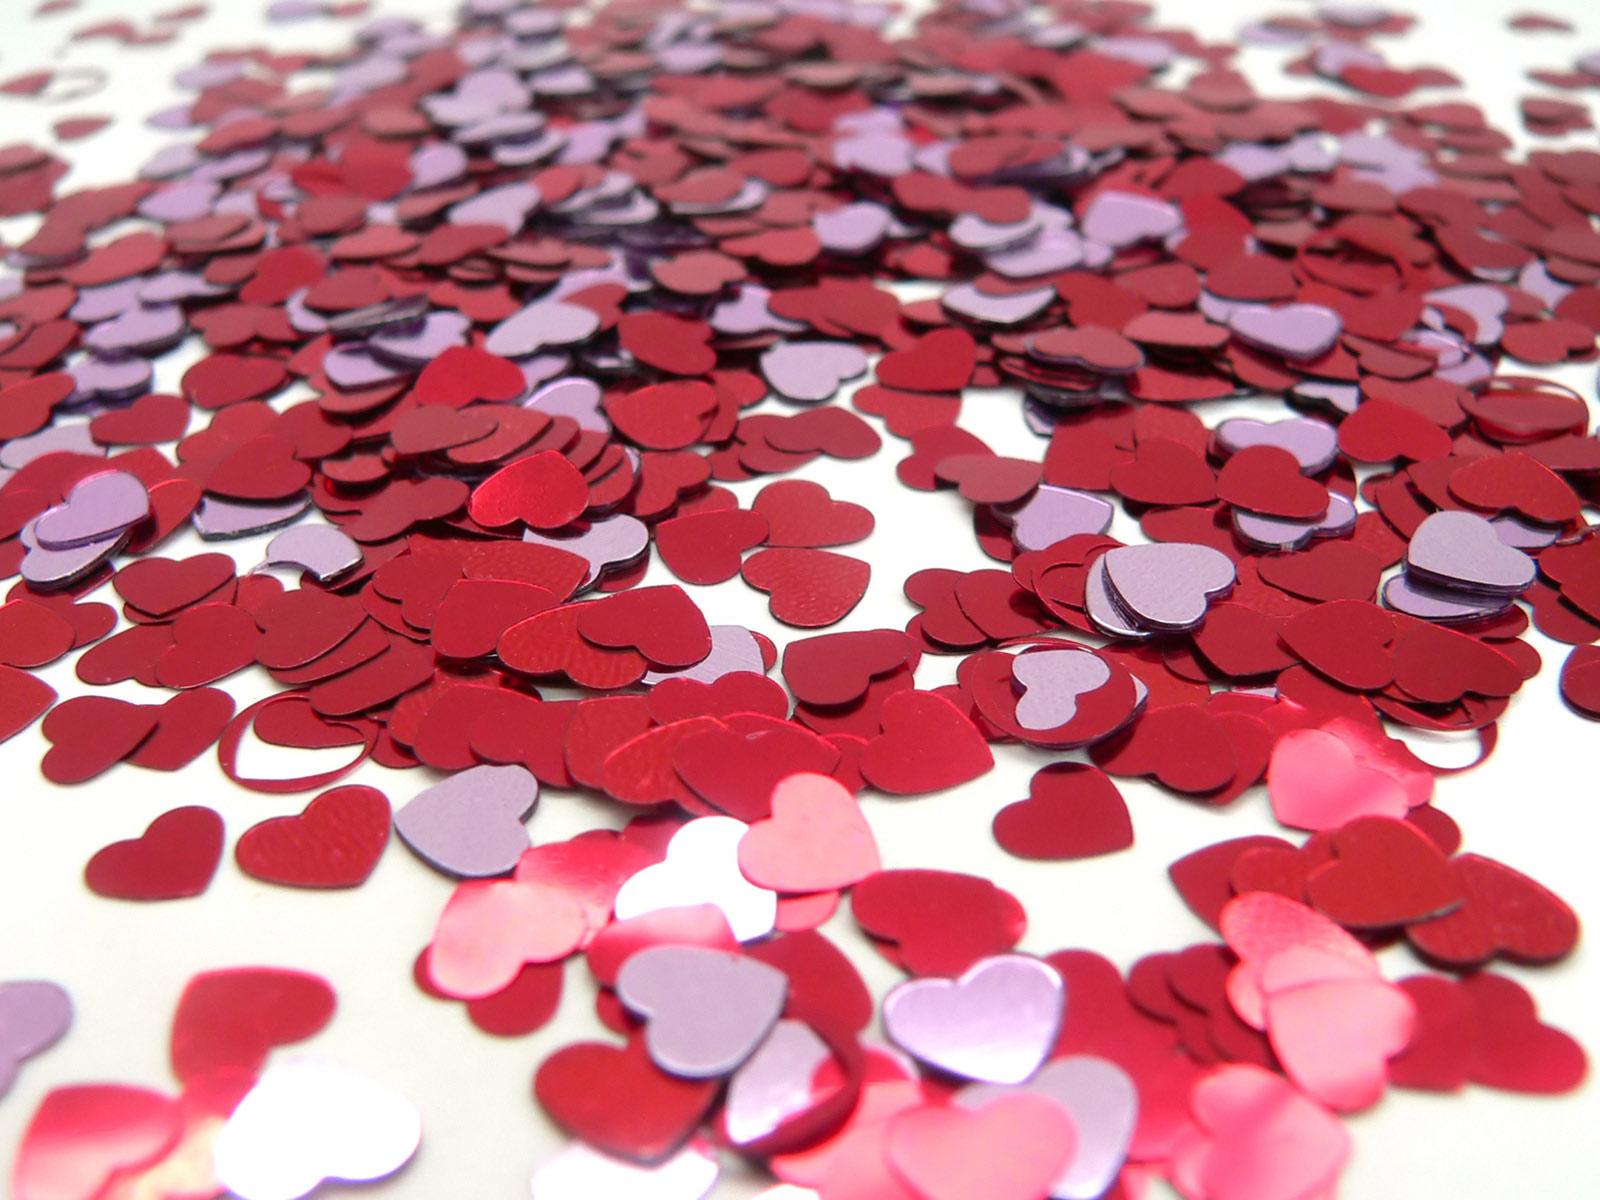 Valentines Computer Wallpaper - WallpaperSafari